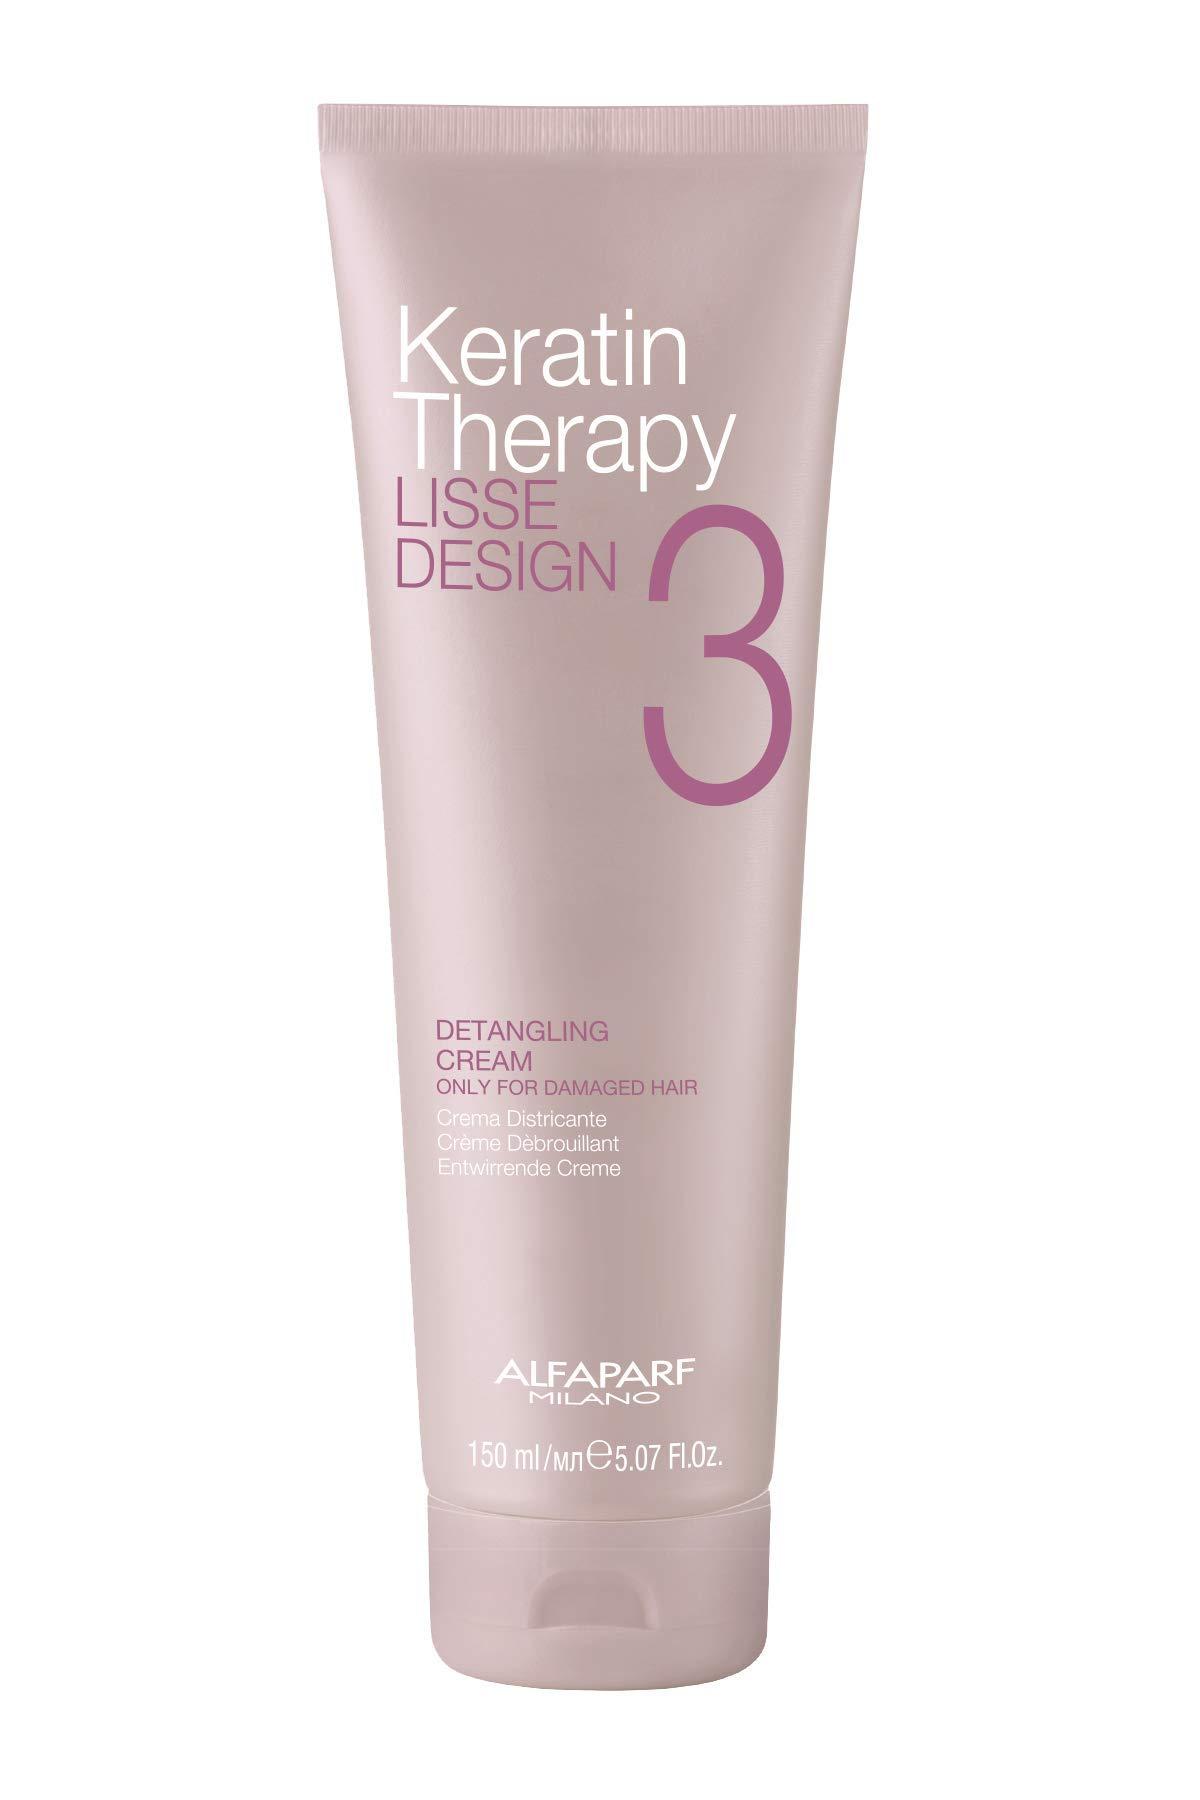 Alfaparf Milano Keratin Therapy Lisse Design Detangling Cream Maintains and Enhances Keratin Treatments Protects Against Heat Professional Salon Quality, 57 Fl Oz